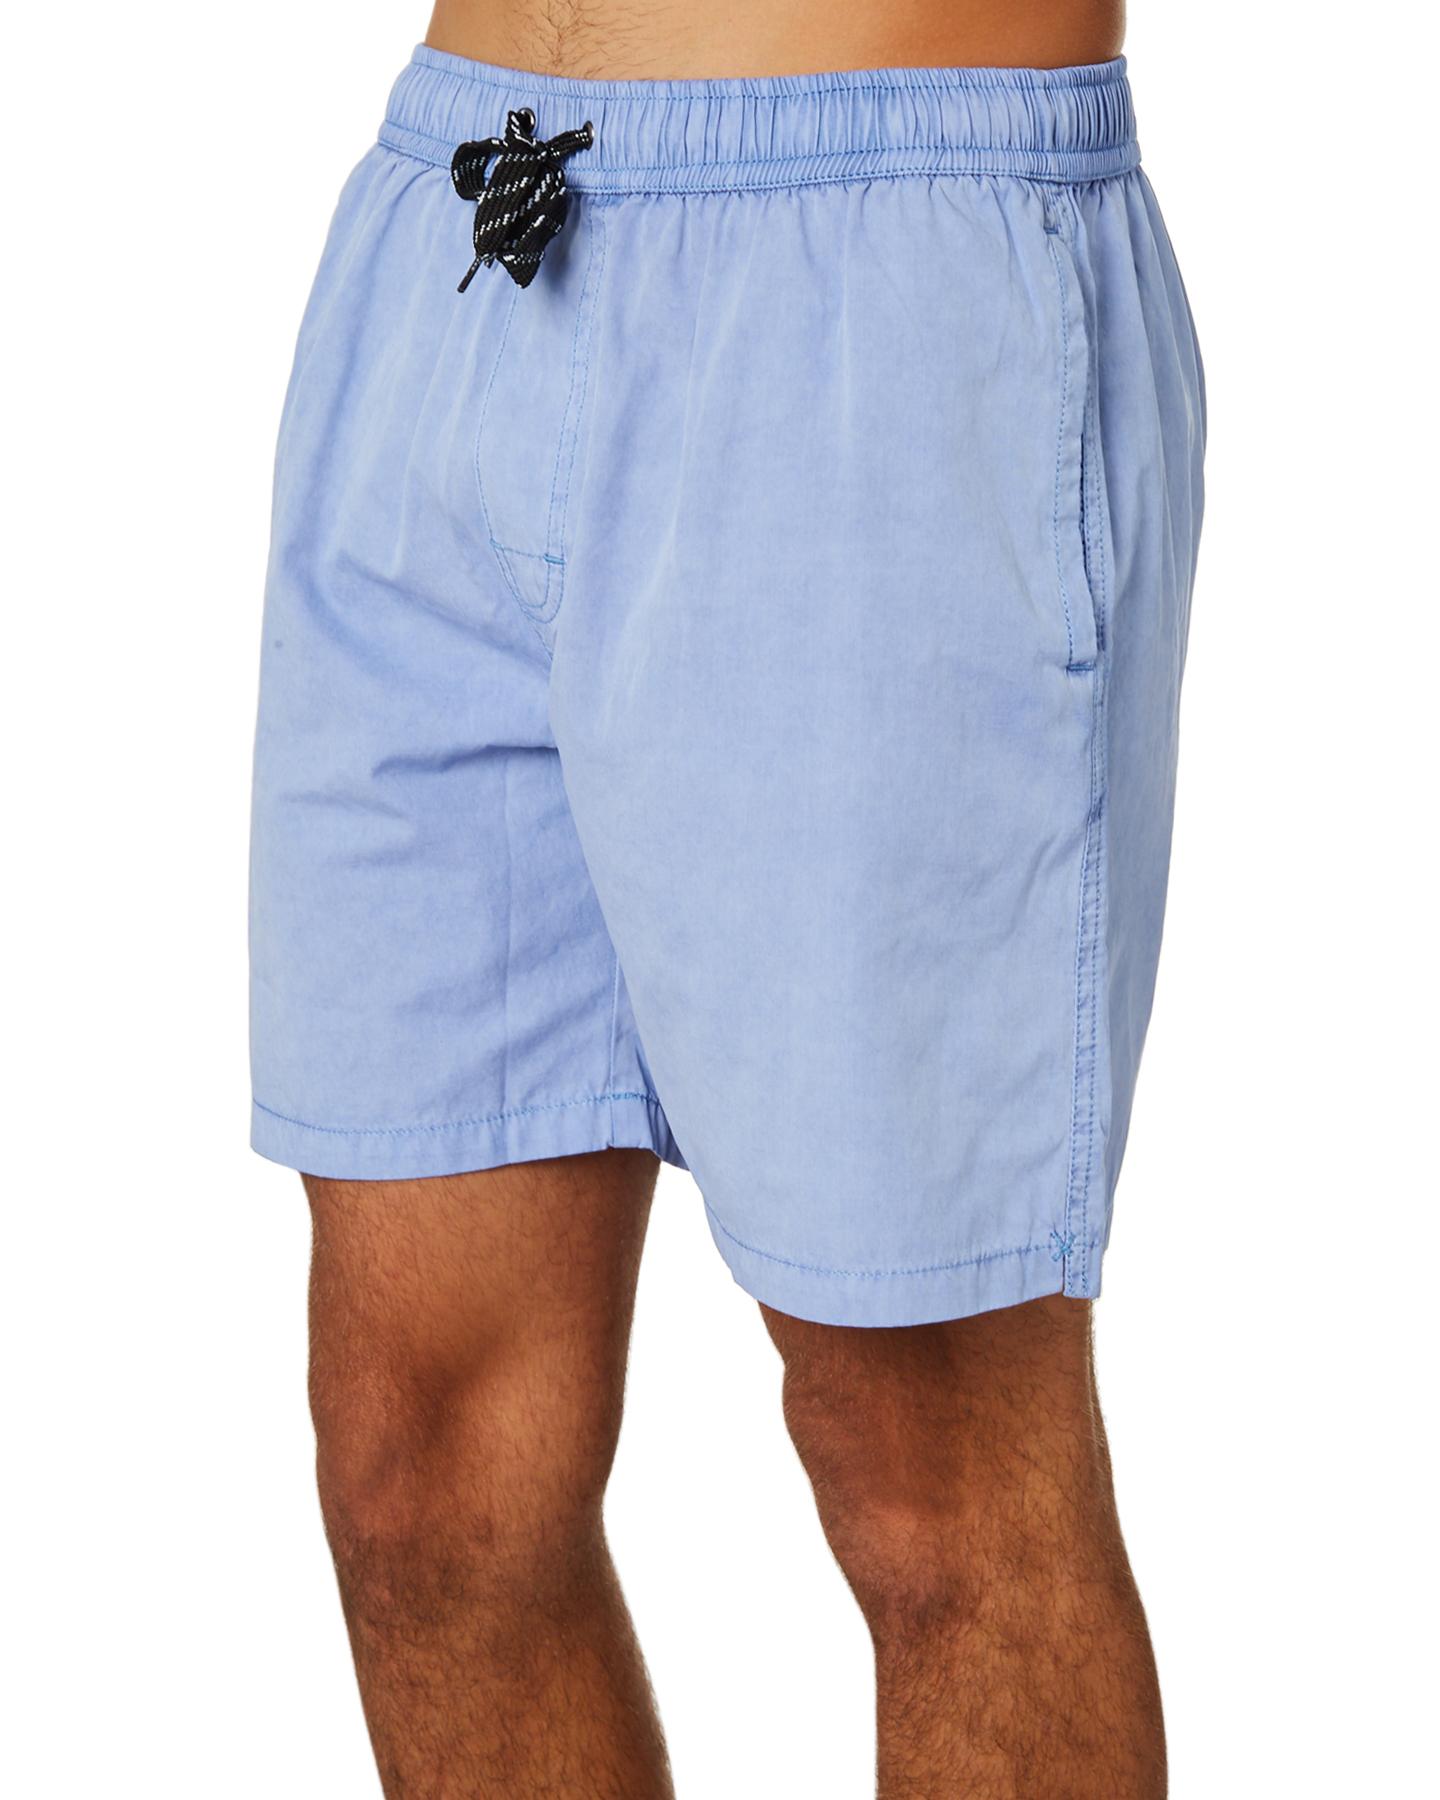 New-Swell-Men-039-s-Malibu-Mens-Beach-Short-Cotton-Polyester-Grey thumbnail 20